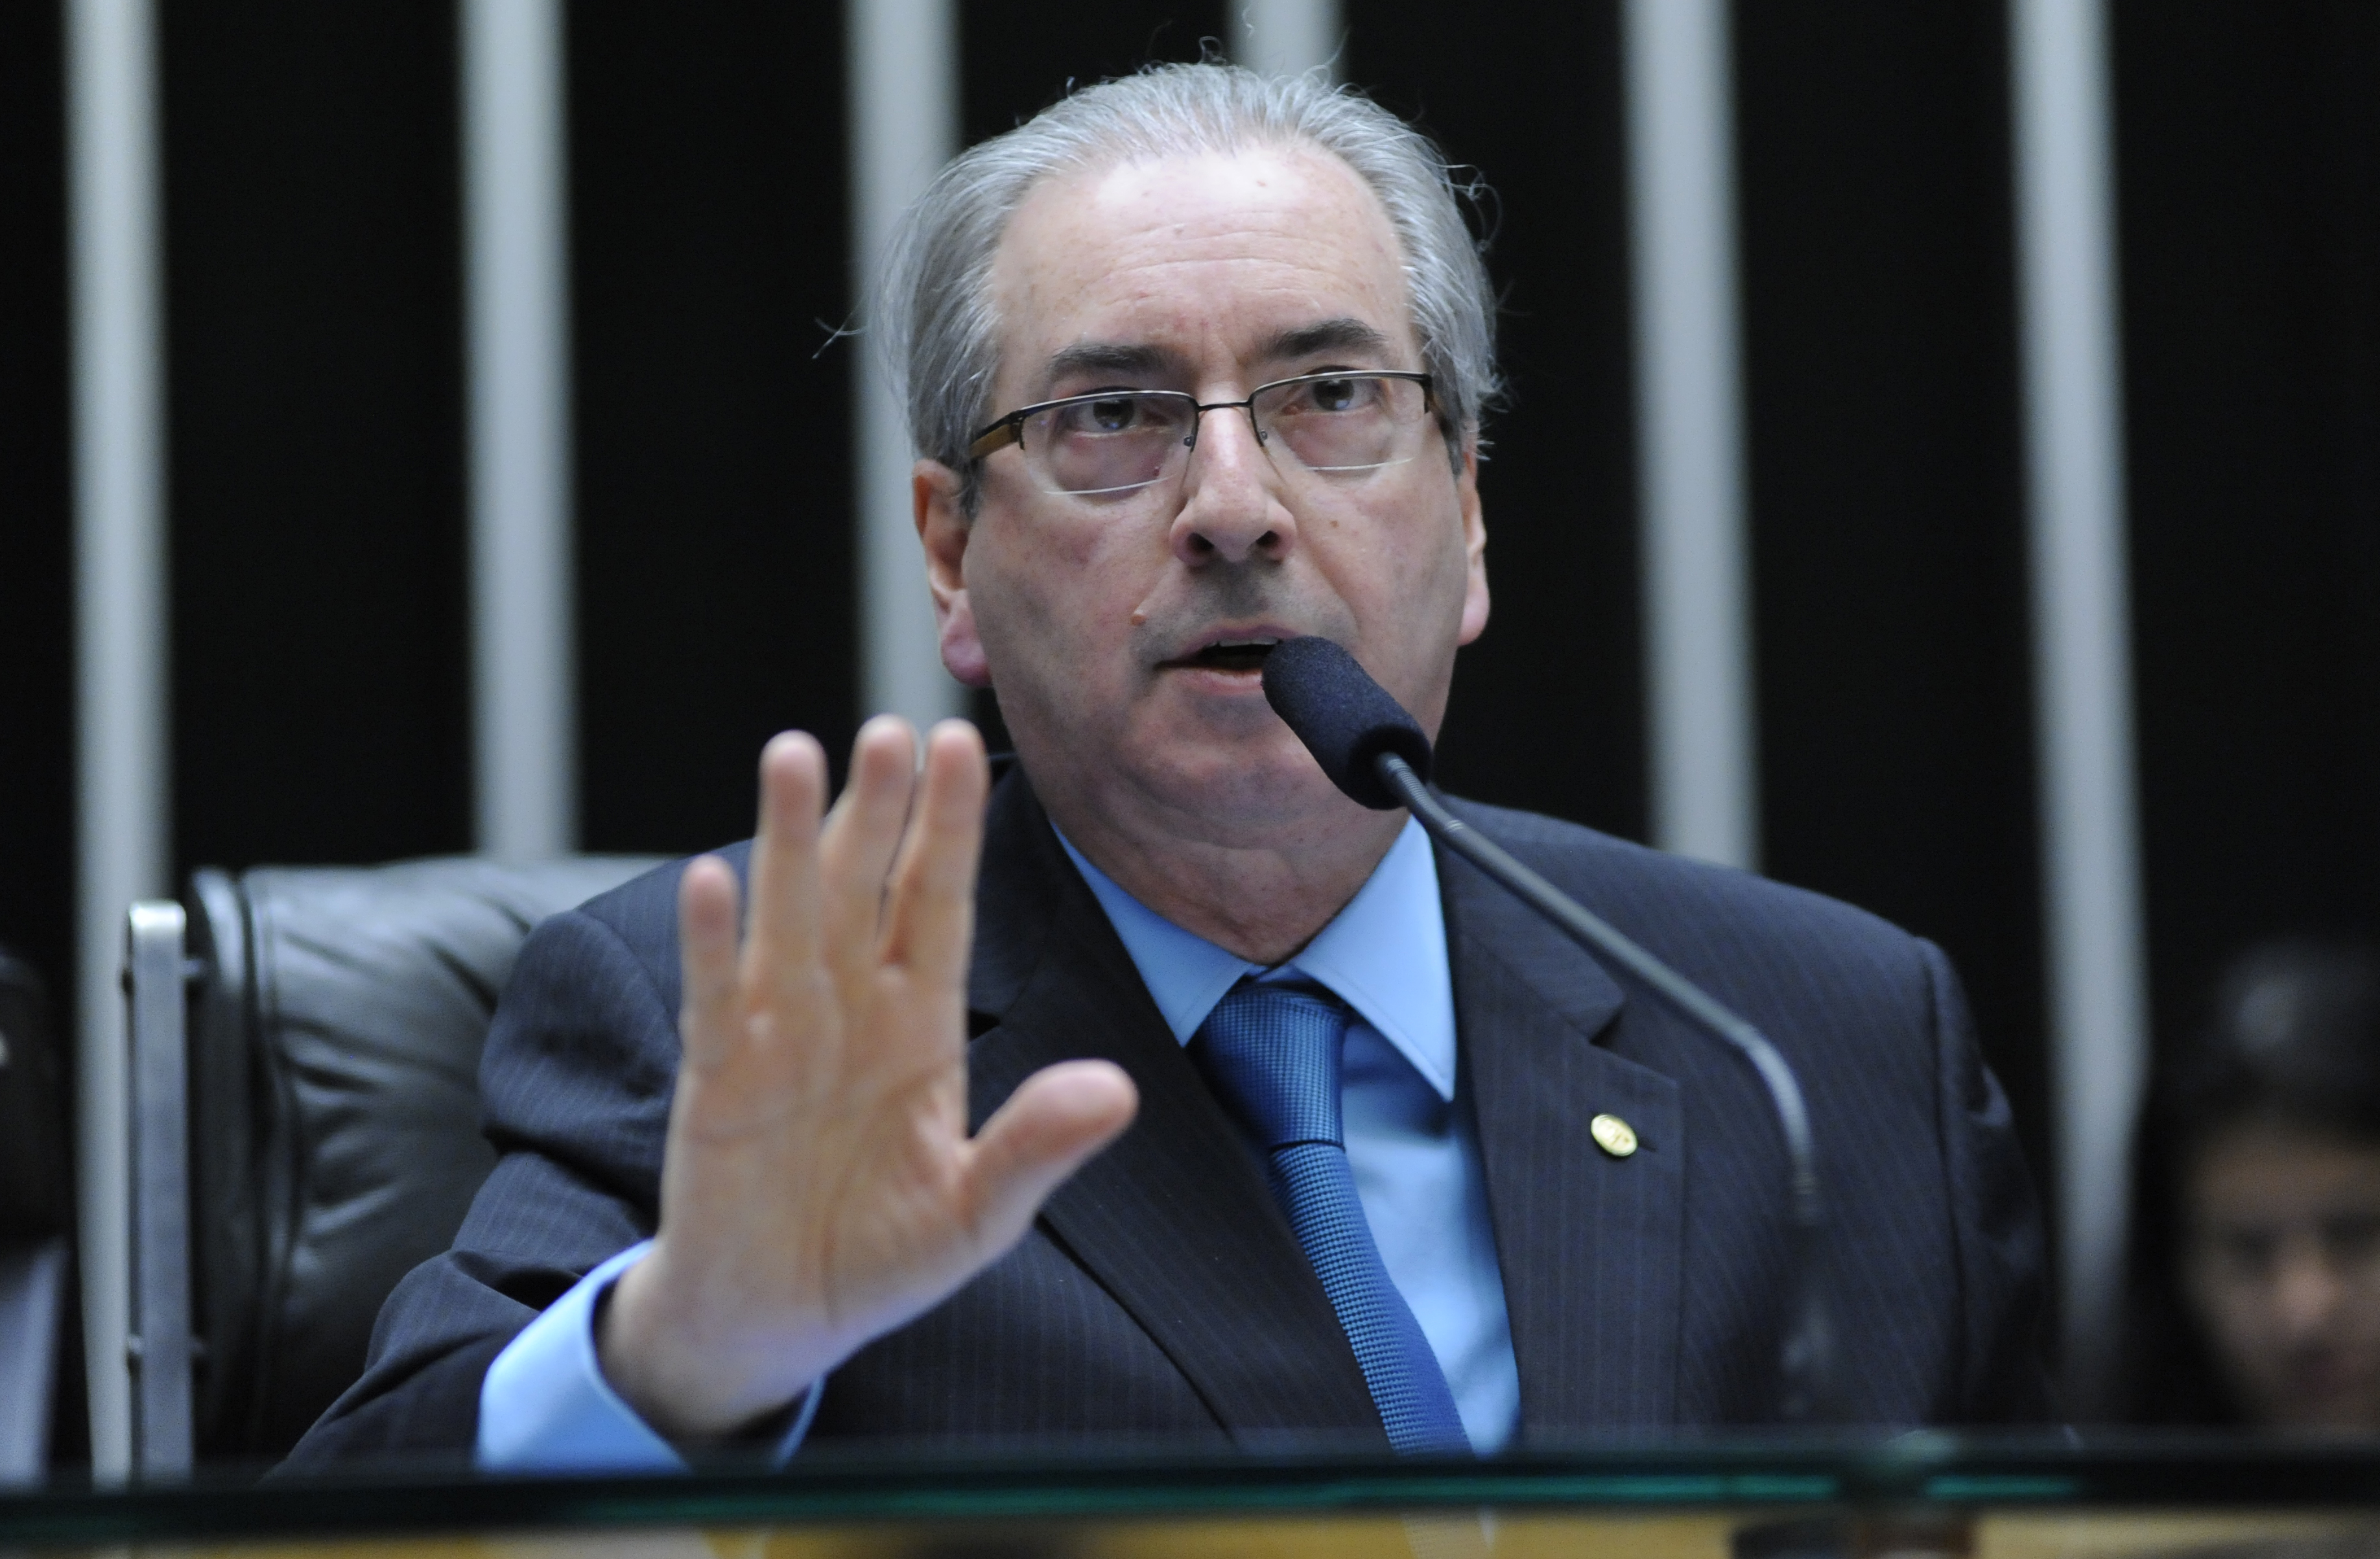 Moro condena Eduardo Cunha a 15 anos de prisão